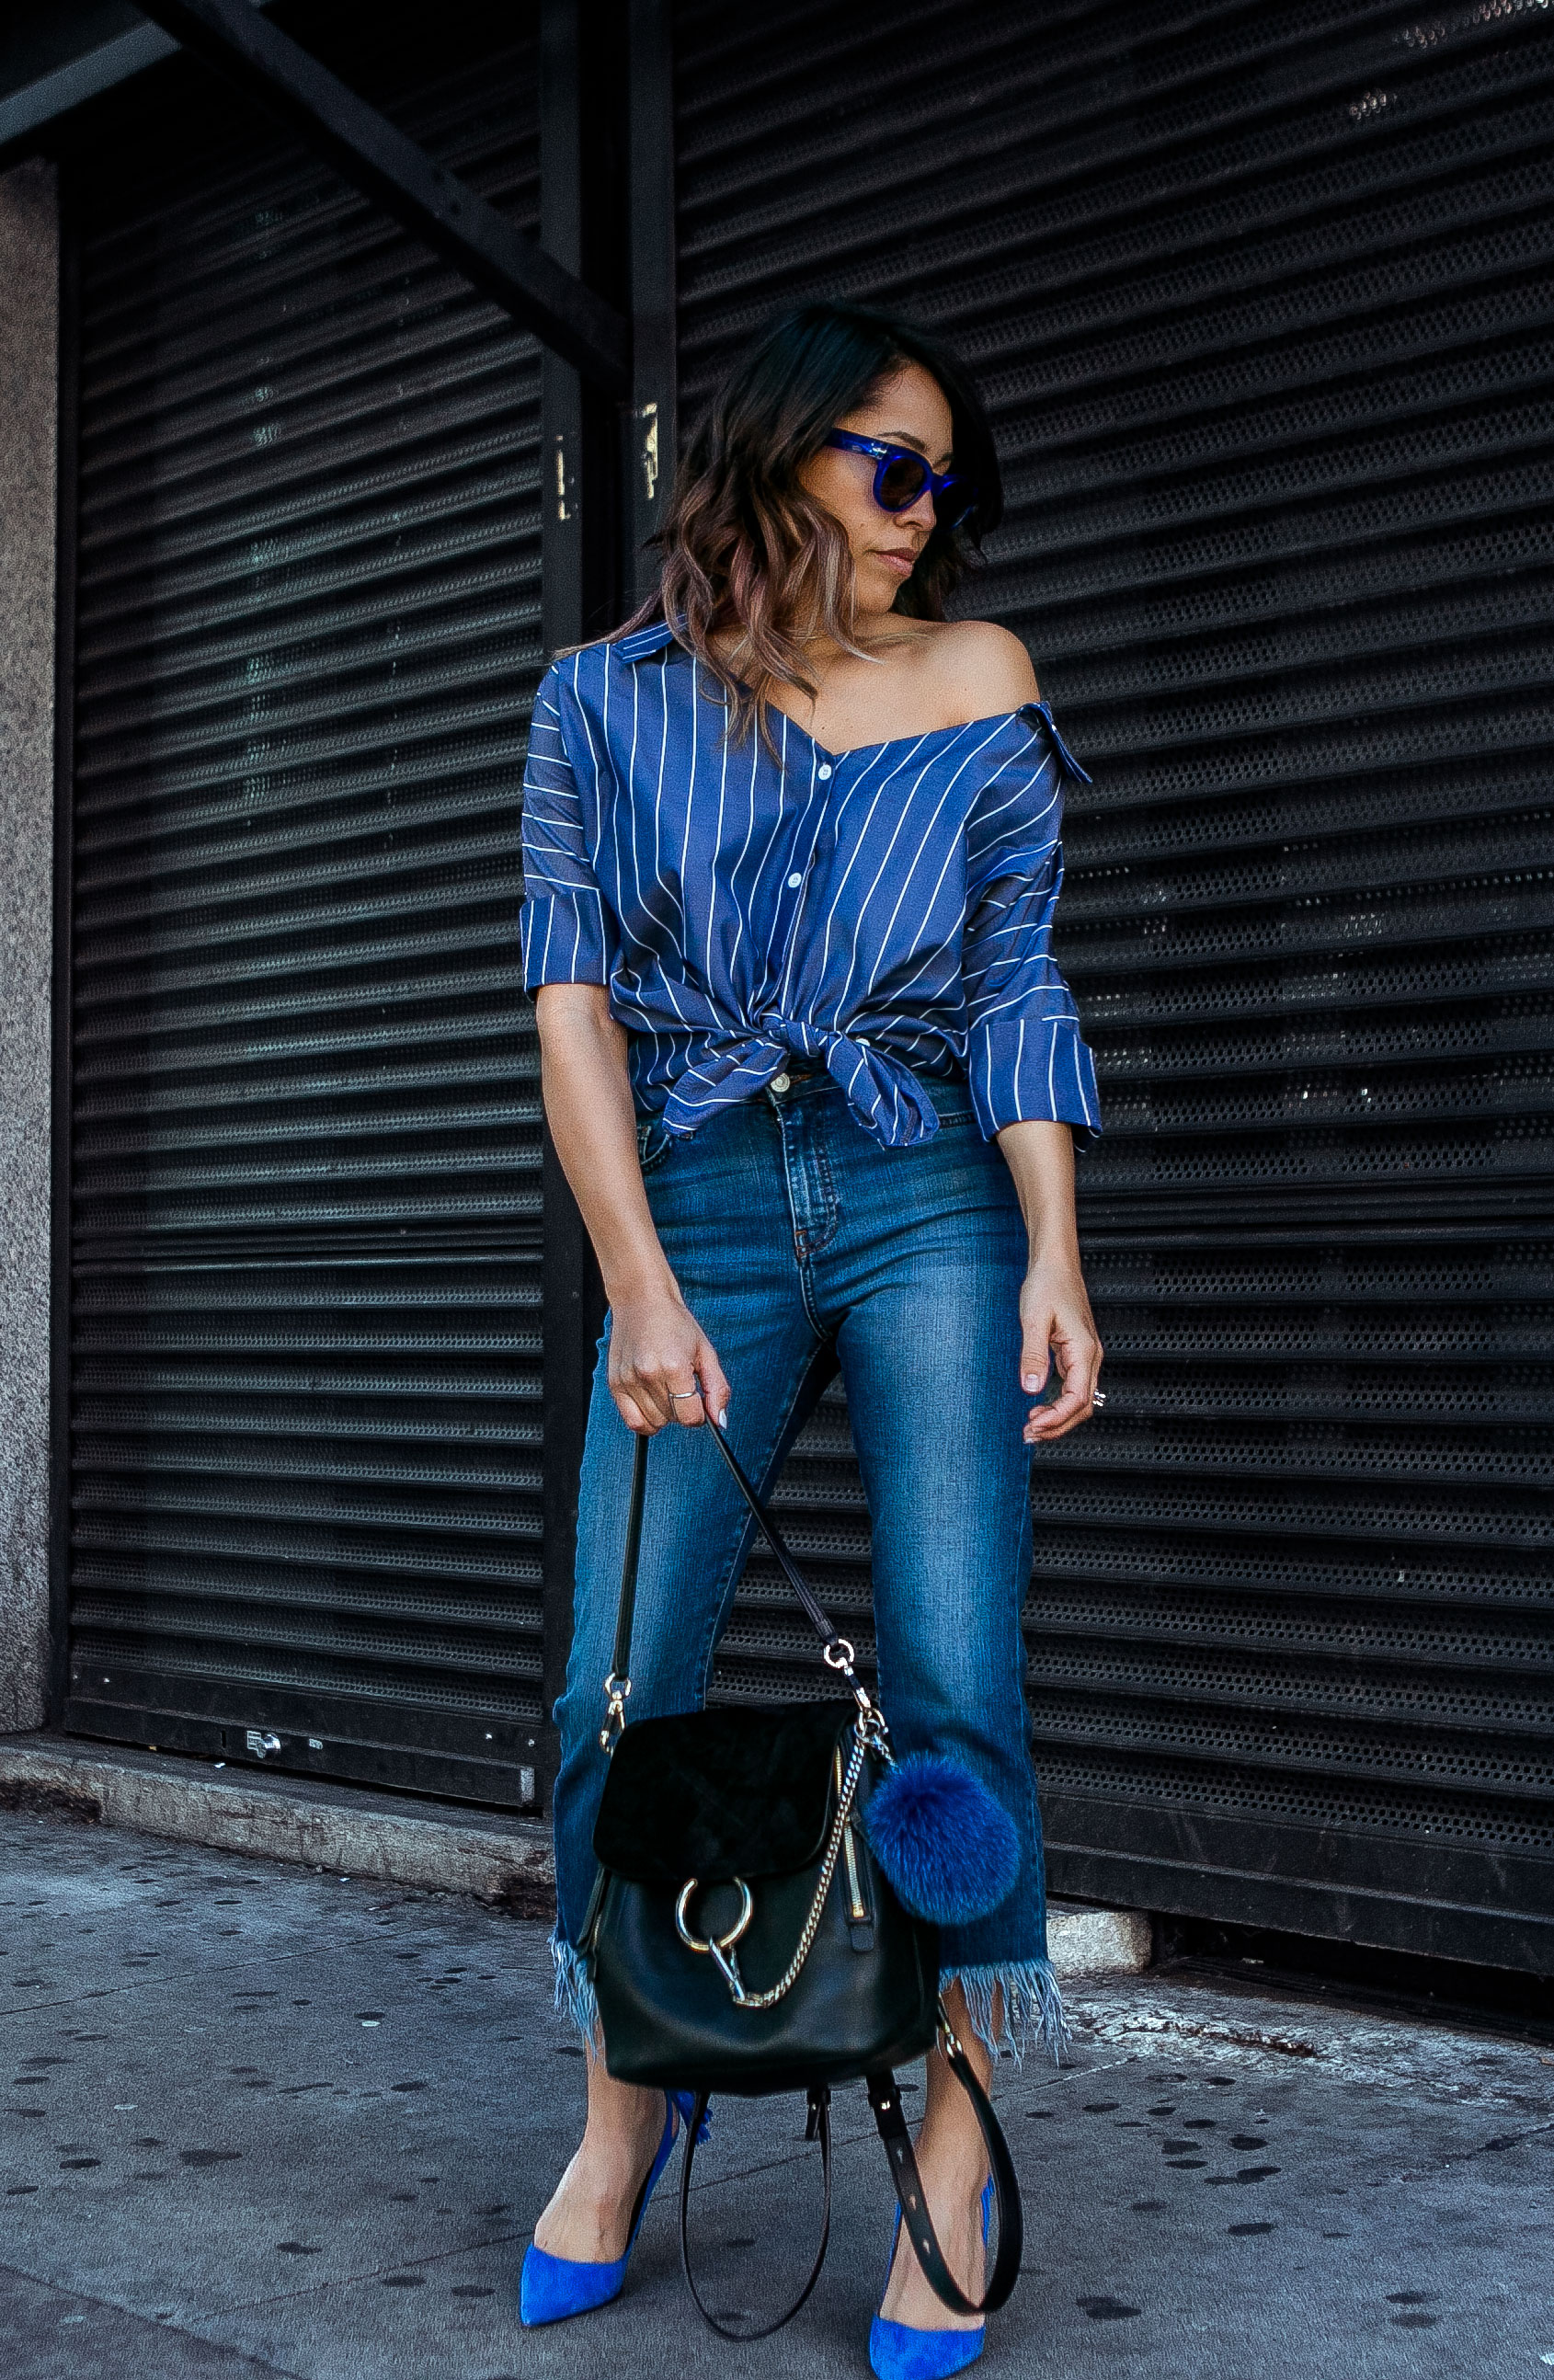 frankvinyl_fray_jeans1